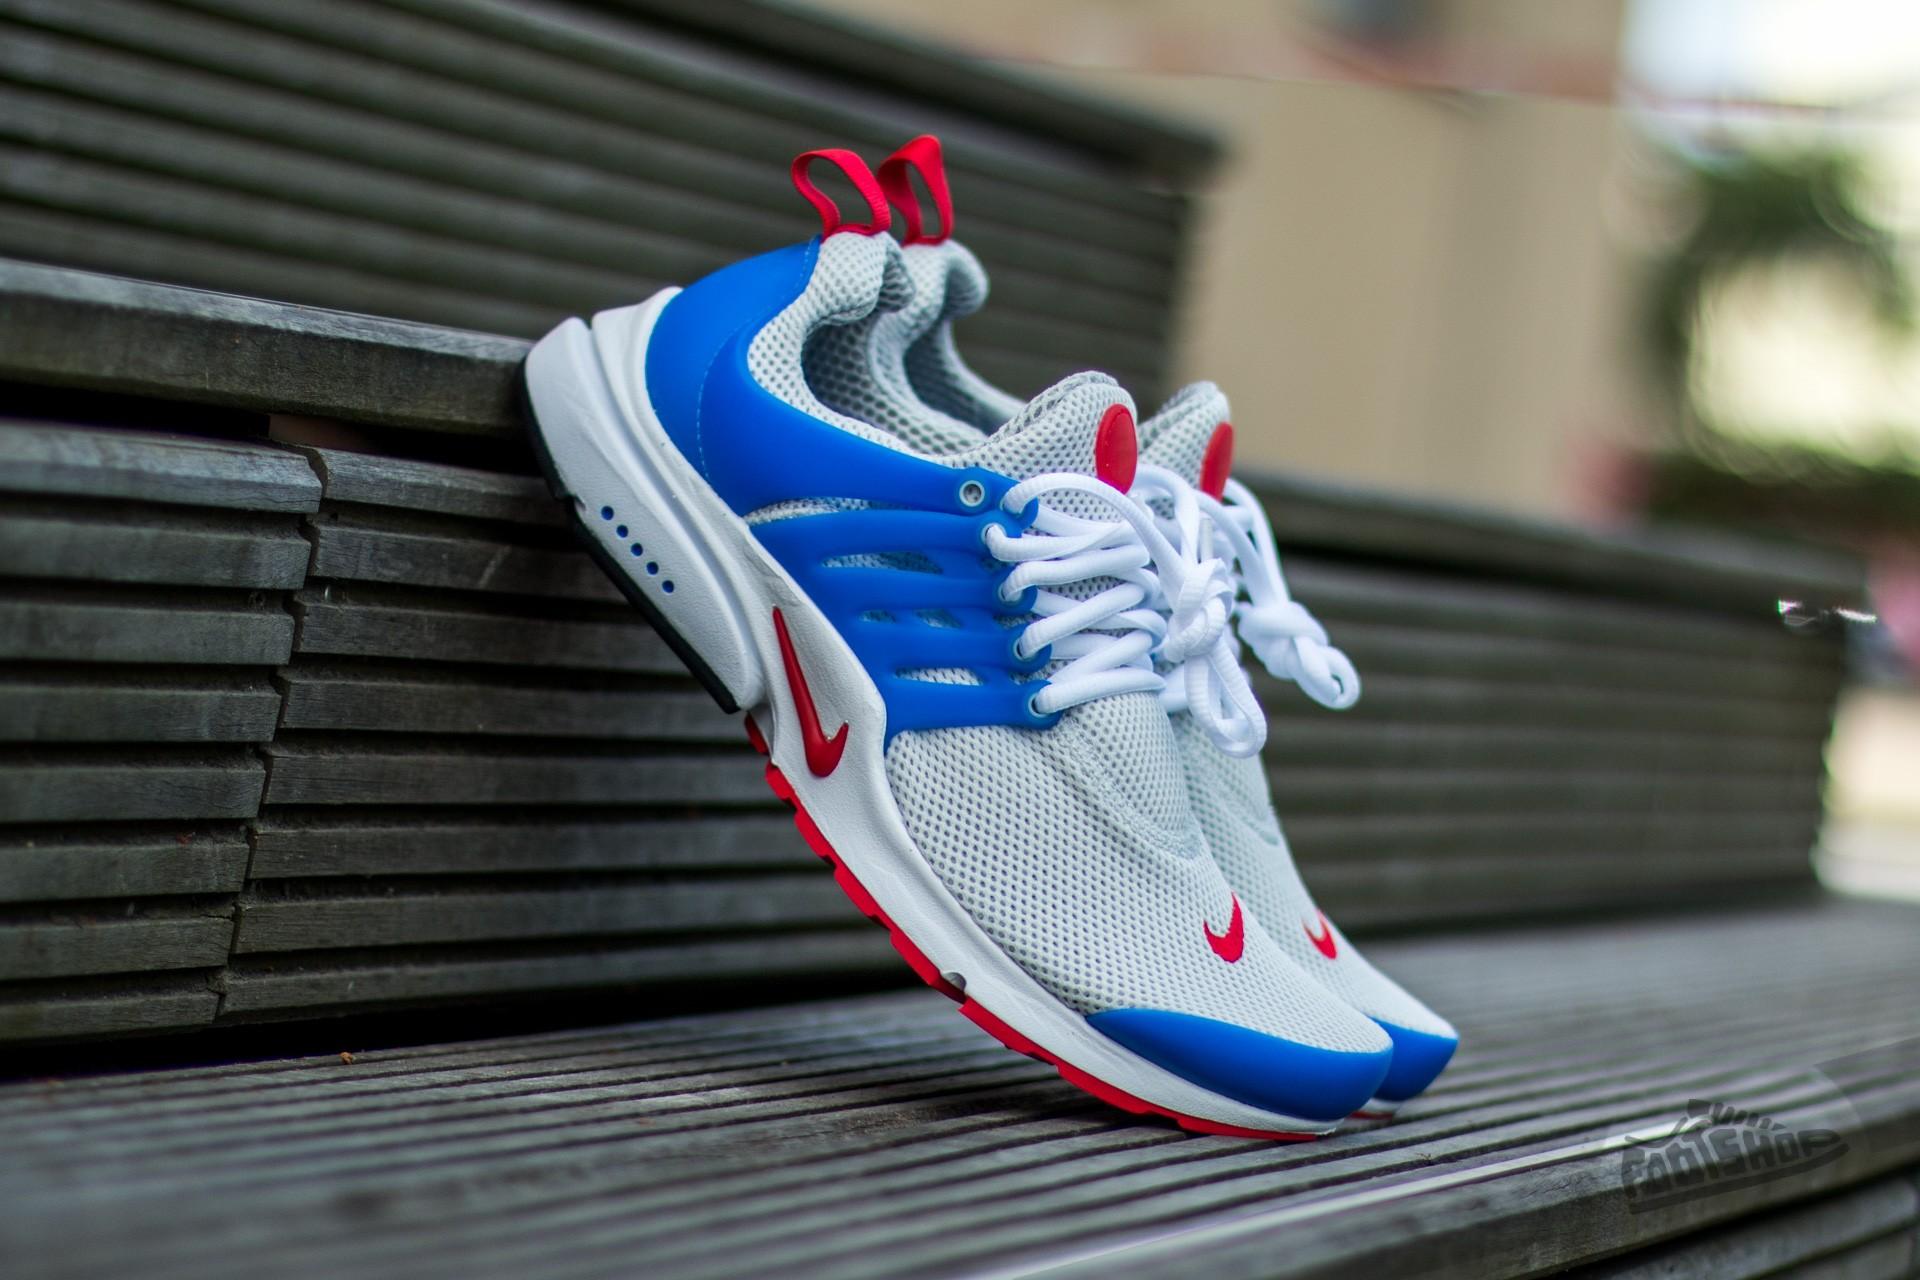 nike presto blue running shoes price